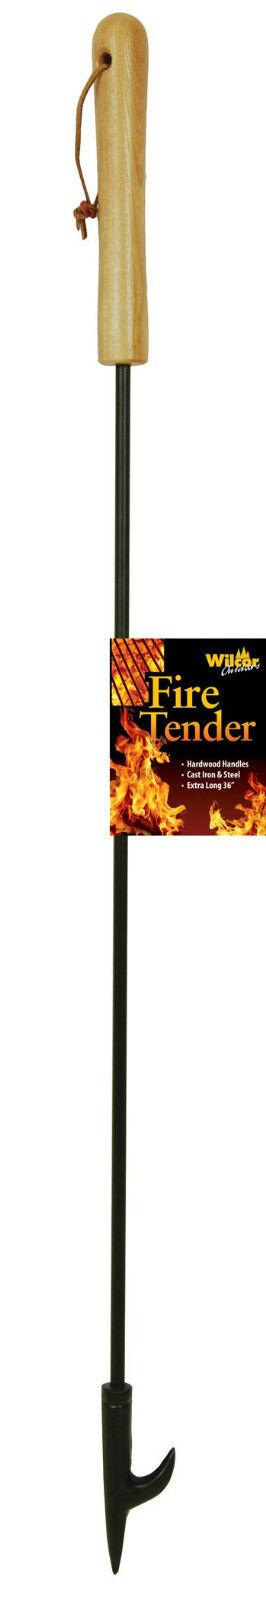 Campfire Fireplace Fire Tender Poker Tool Extra Long 36